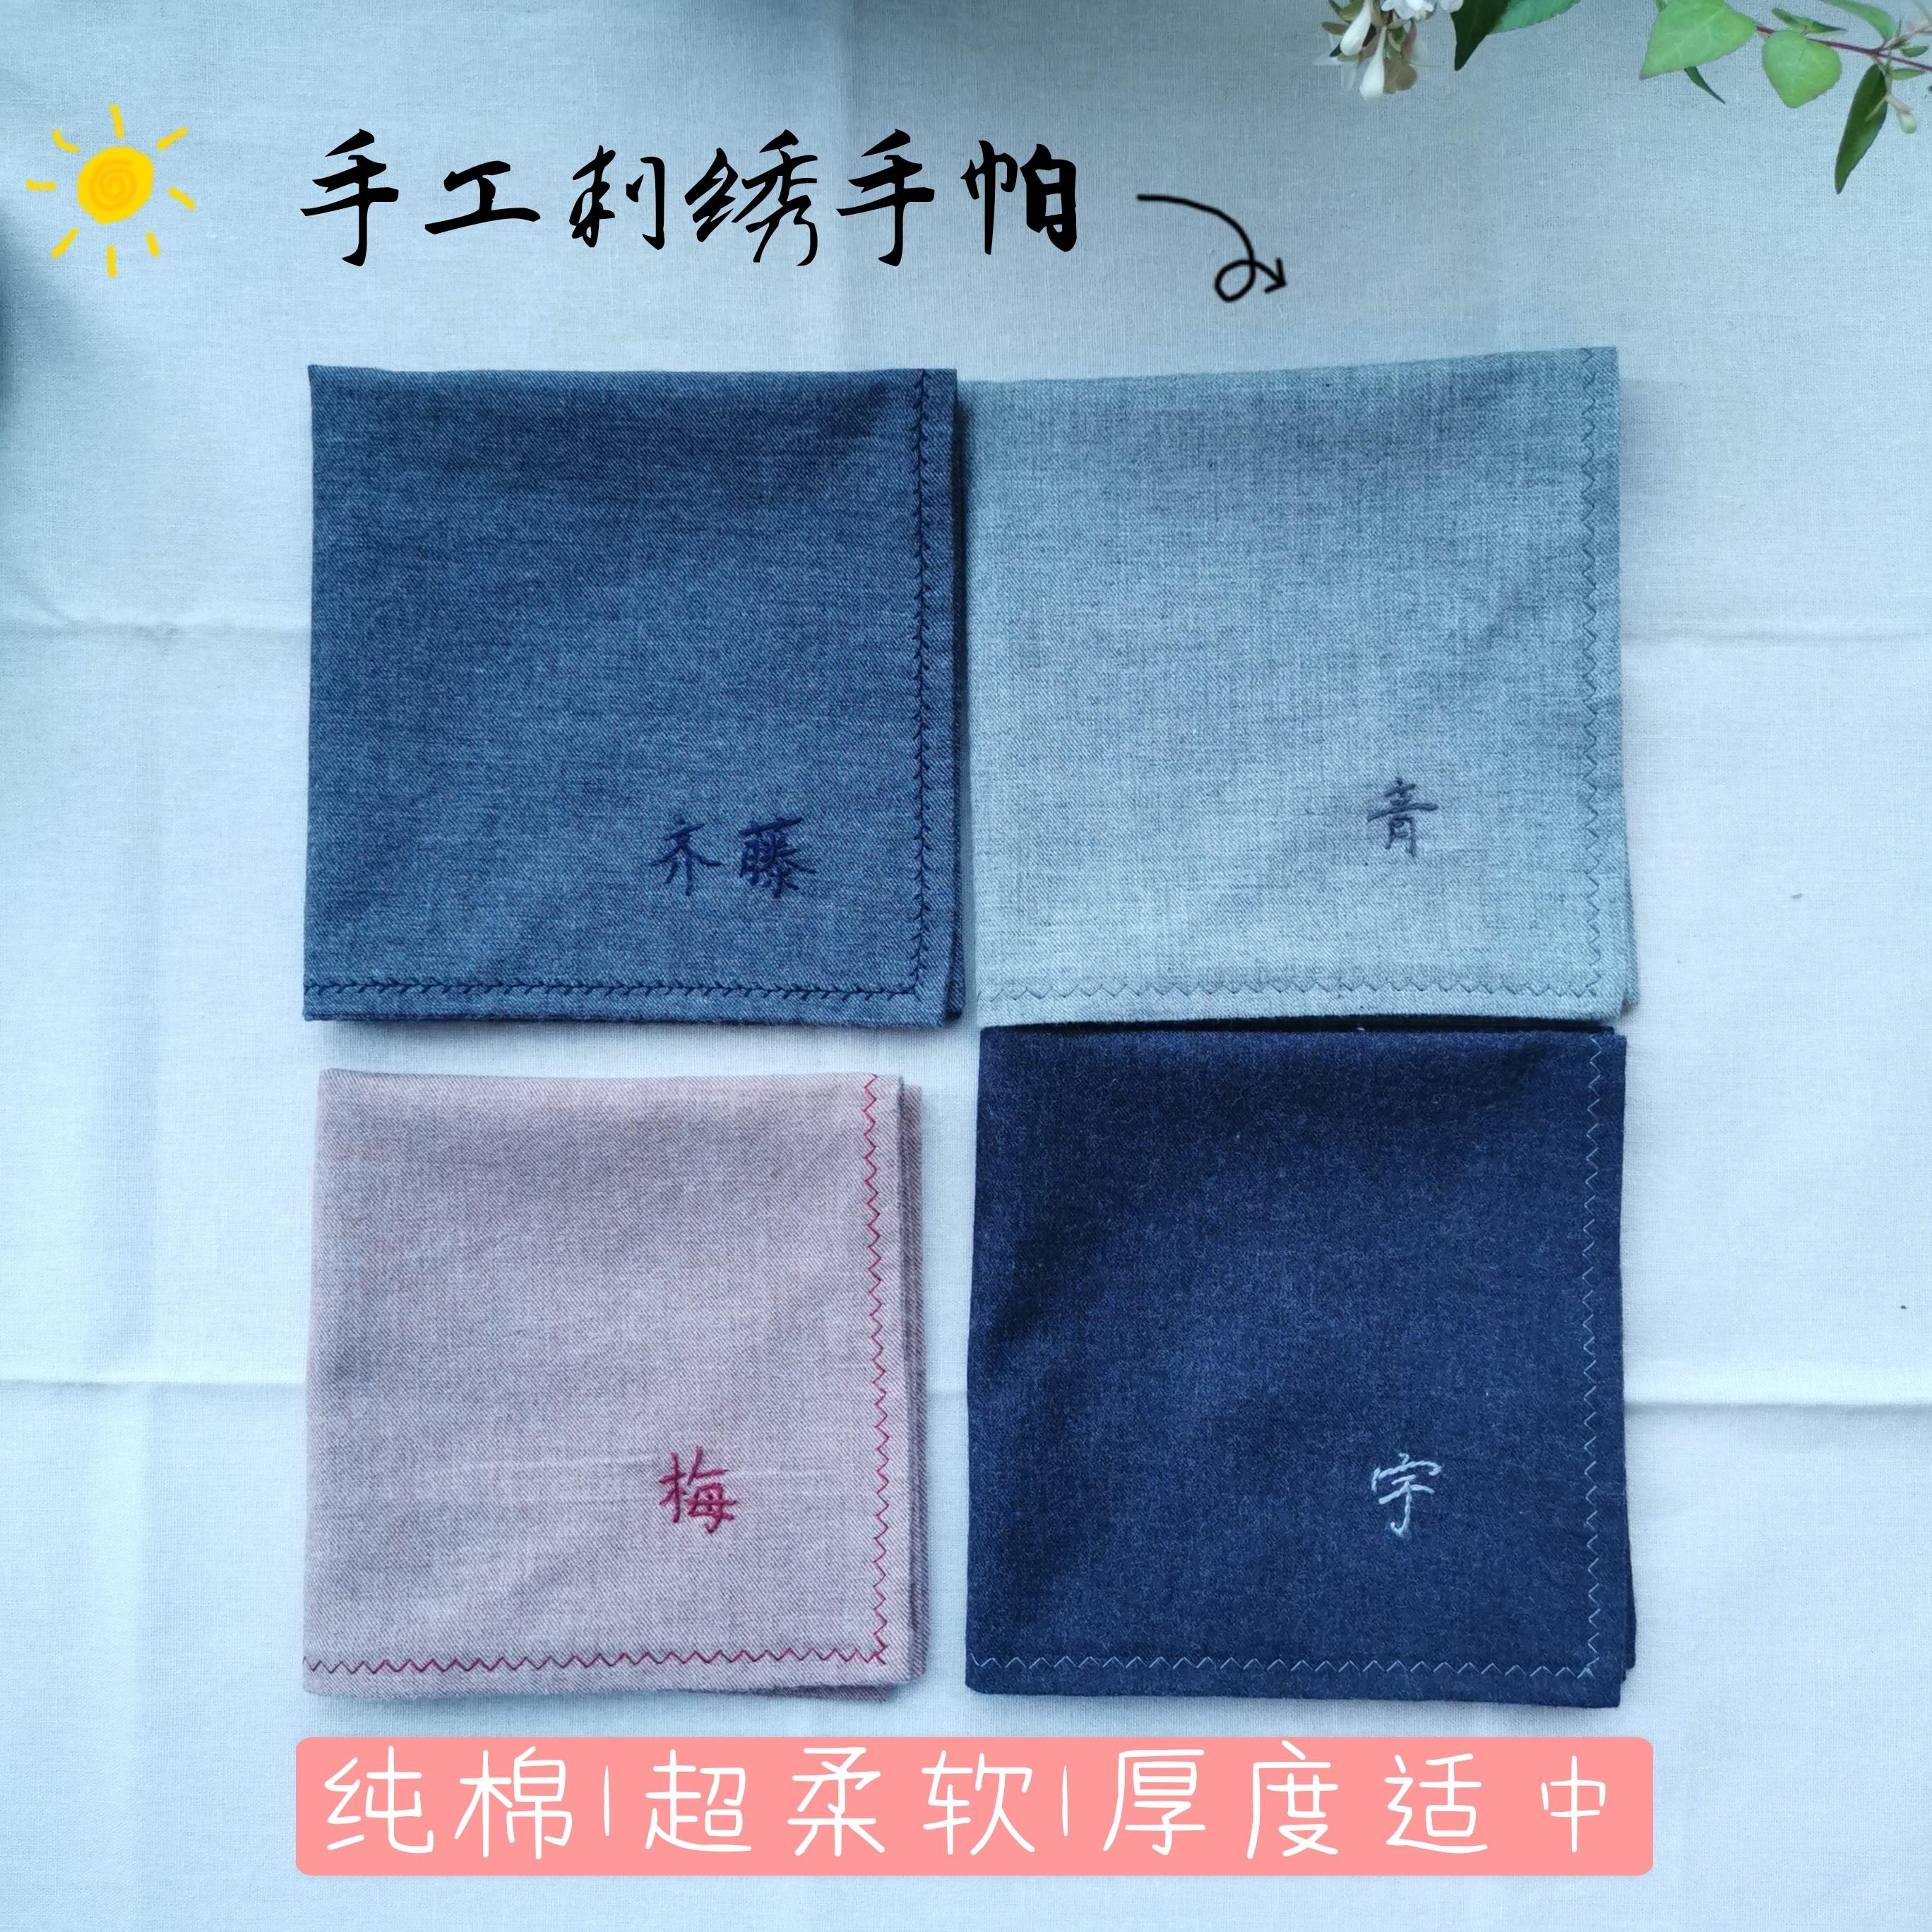 Xinjiang cotton Morandi handmade handkerchief small square towel pure cotton mens and womens antique handkerchief embroidery custom gift